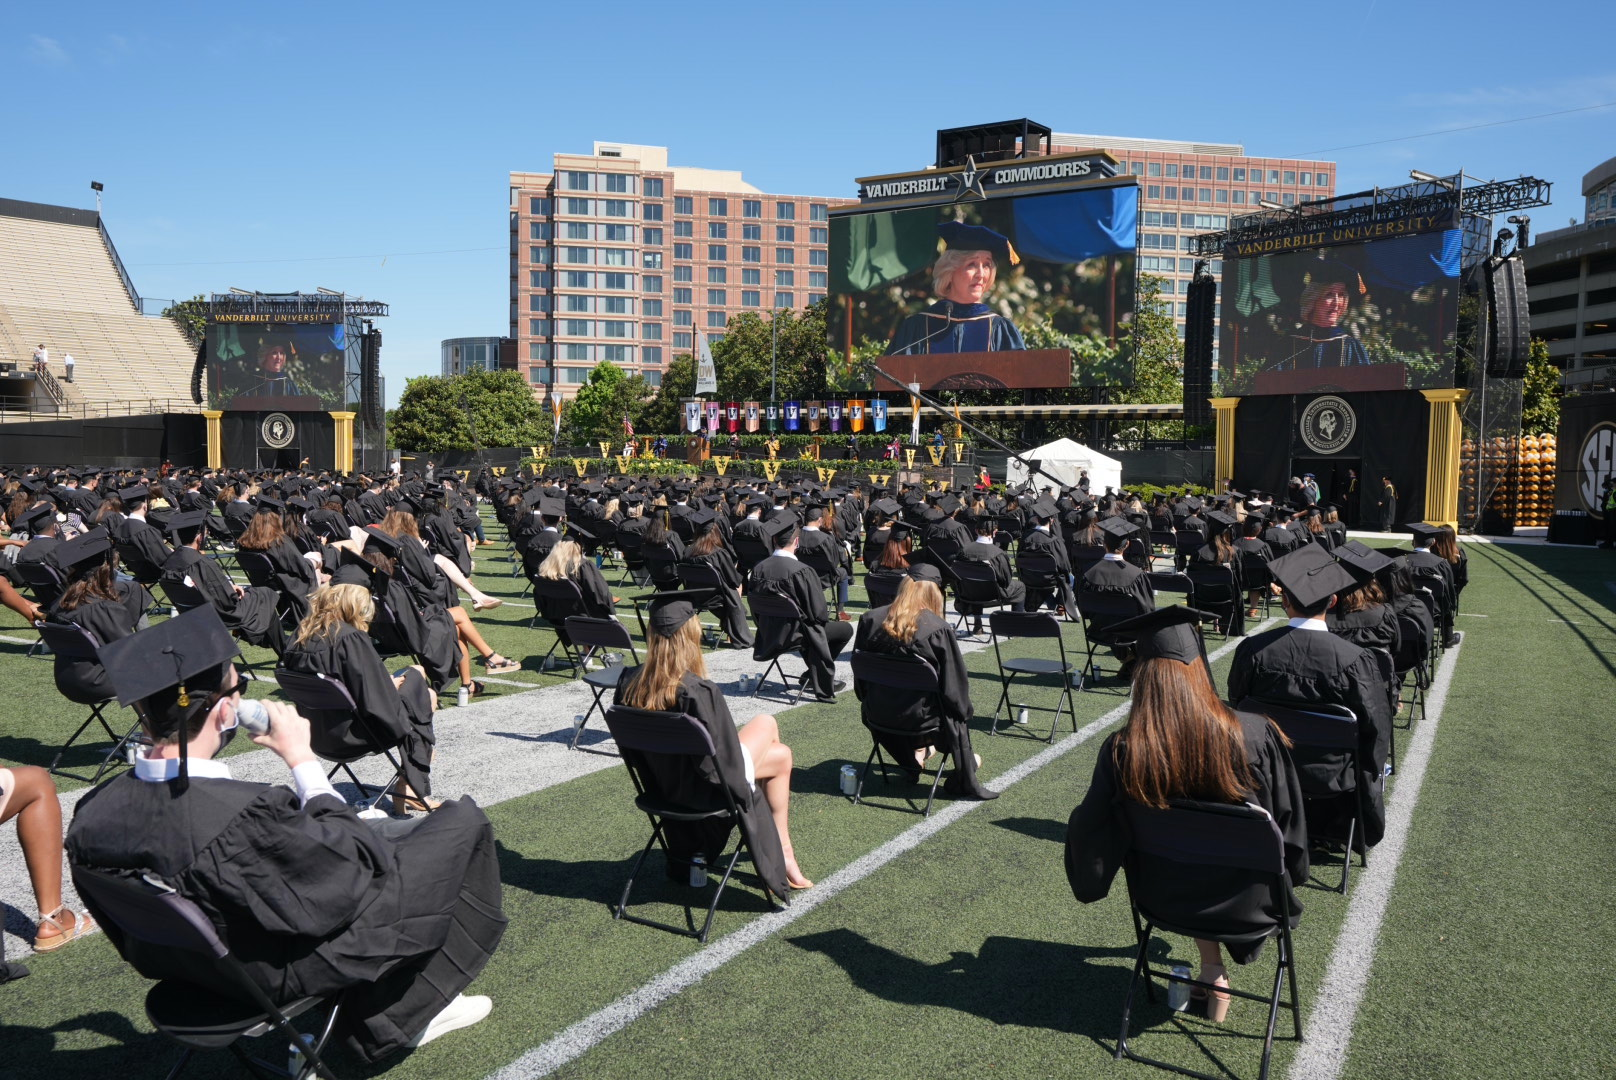 Vanderbilt Provost Susan R. Wente celebrates achievement through adversity with Class of 2020